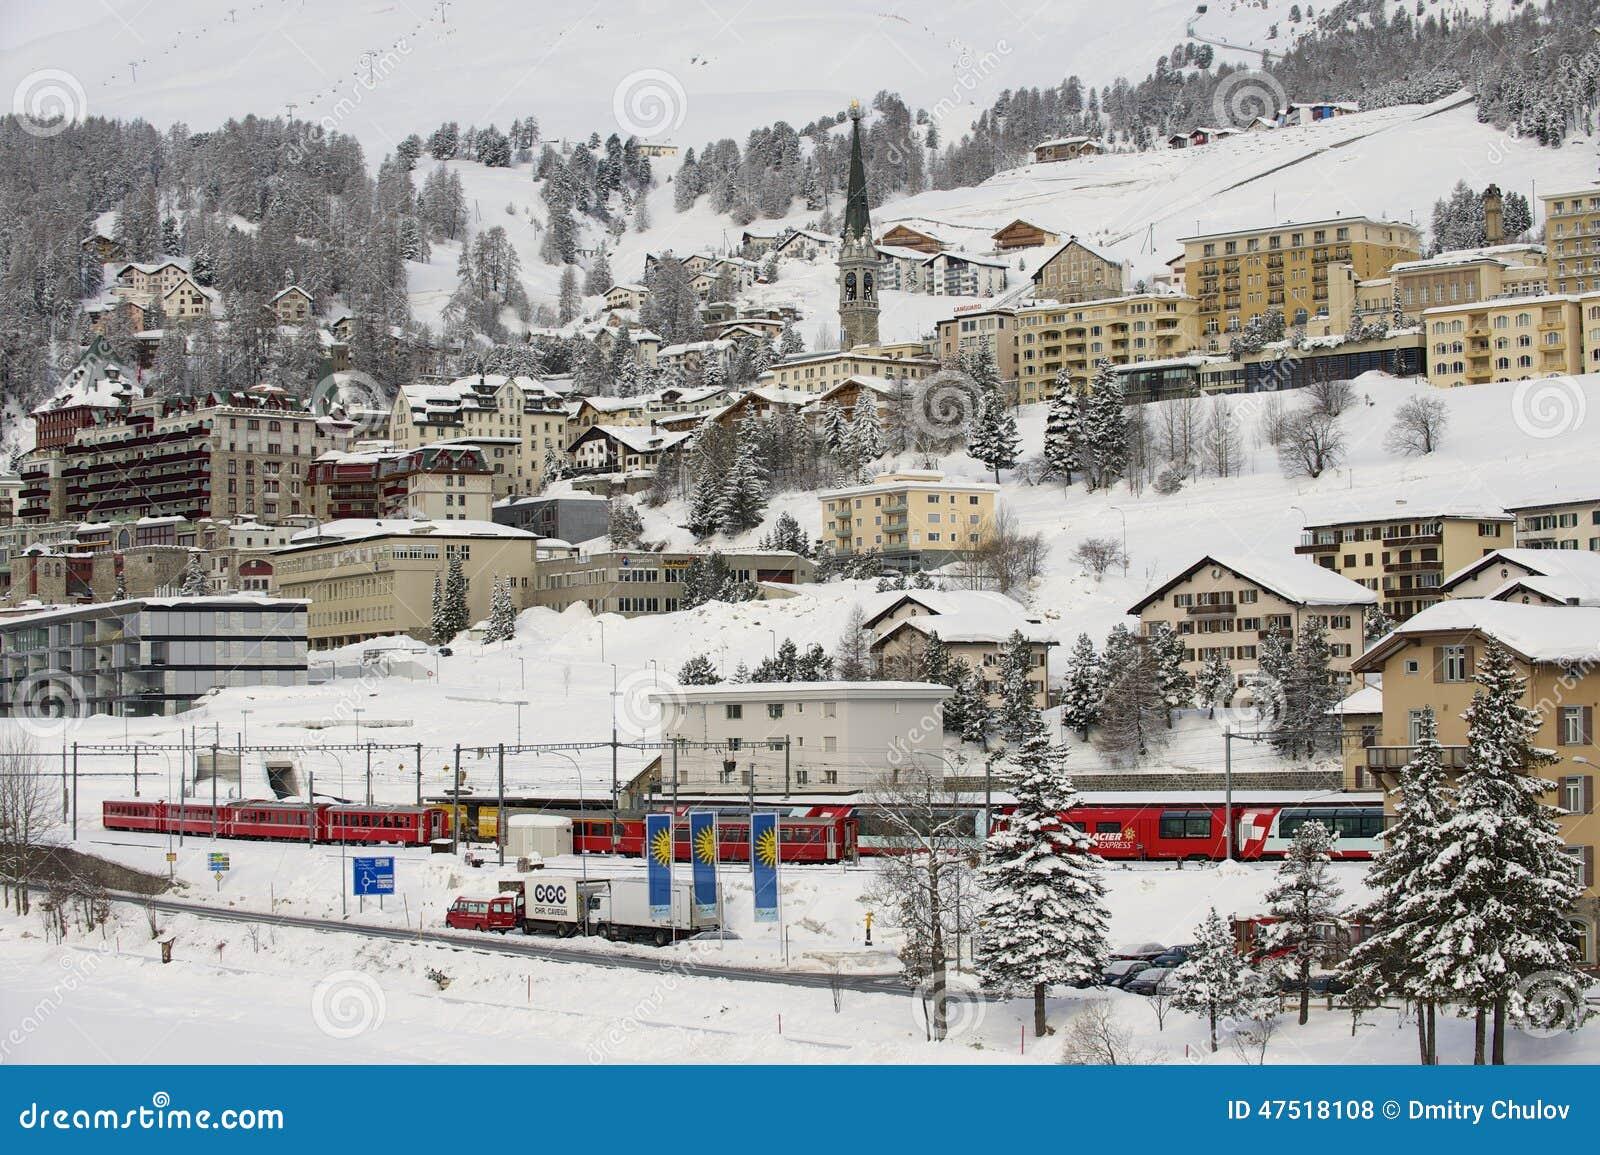 Winter view of the exclusive ski resort of St. Moritz on March 06, 2009 in St. Moritz, Engadine valley, Switzerland.